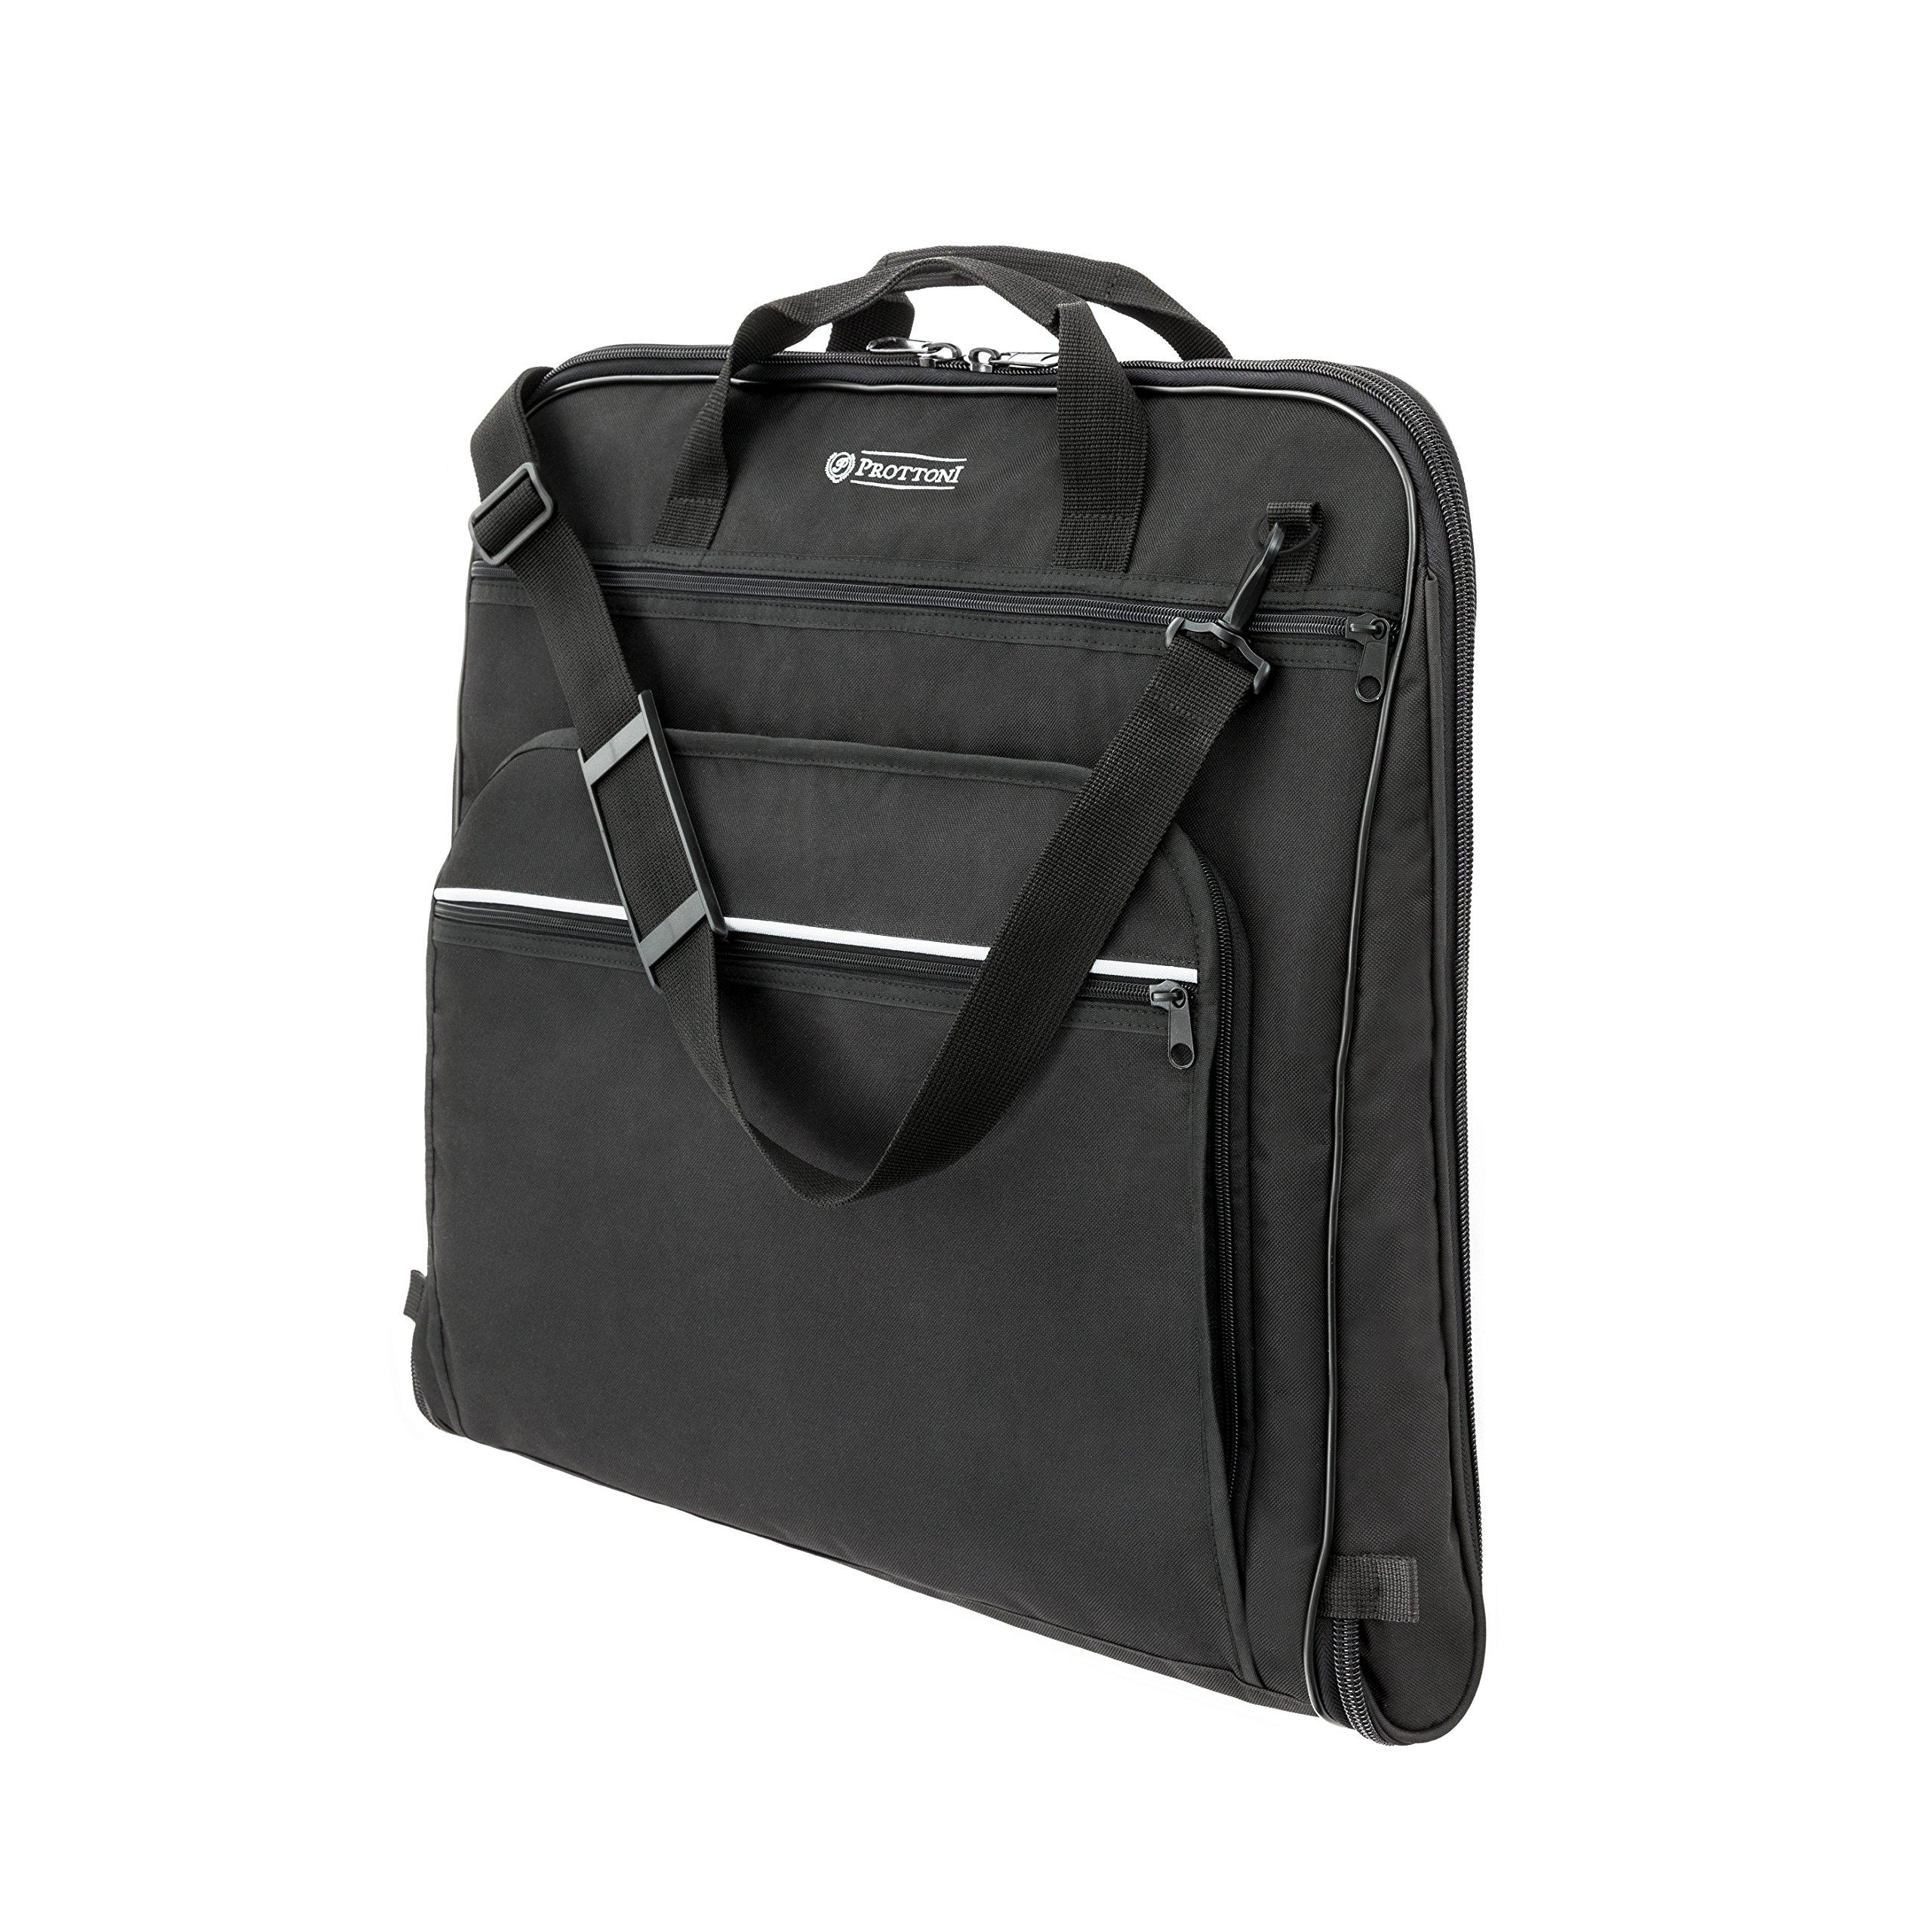 PROTTONI 44'' Garment Bag with Shoulder Strap - Carry On Suit Bag - Built in Hook - Multiple Pockets by Prottoni